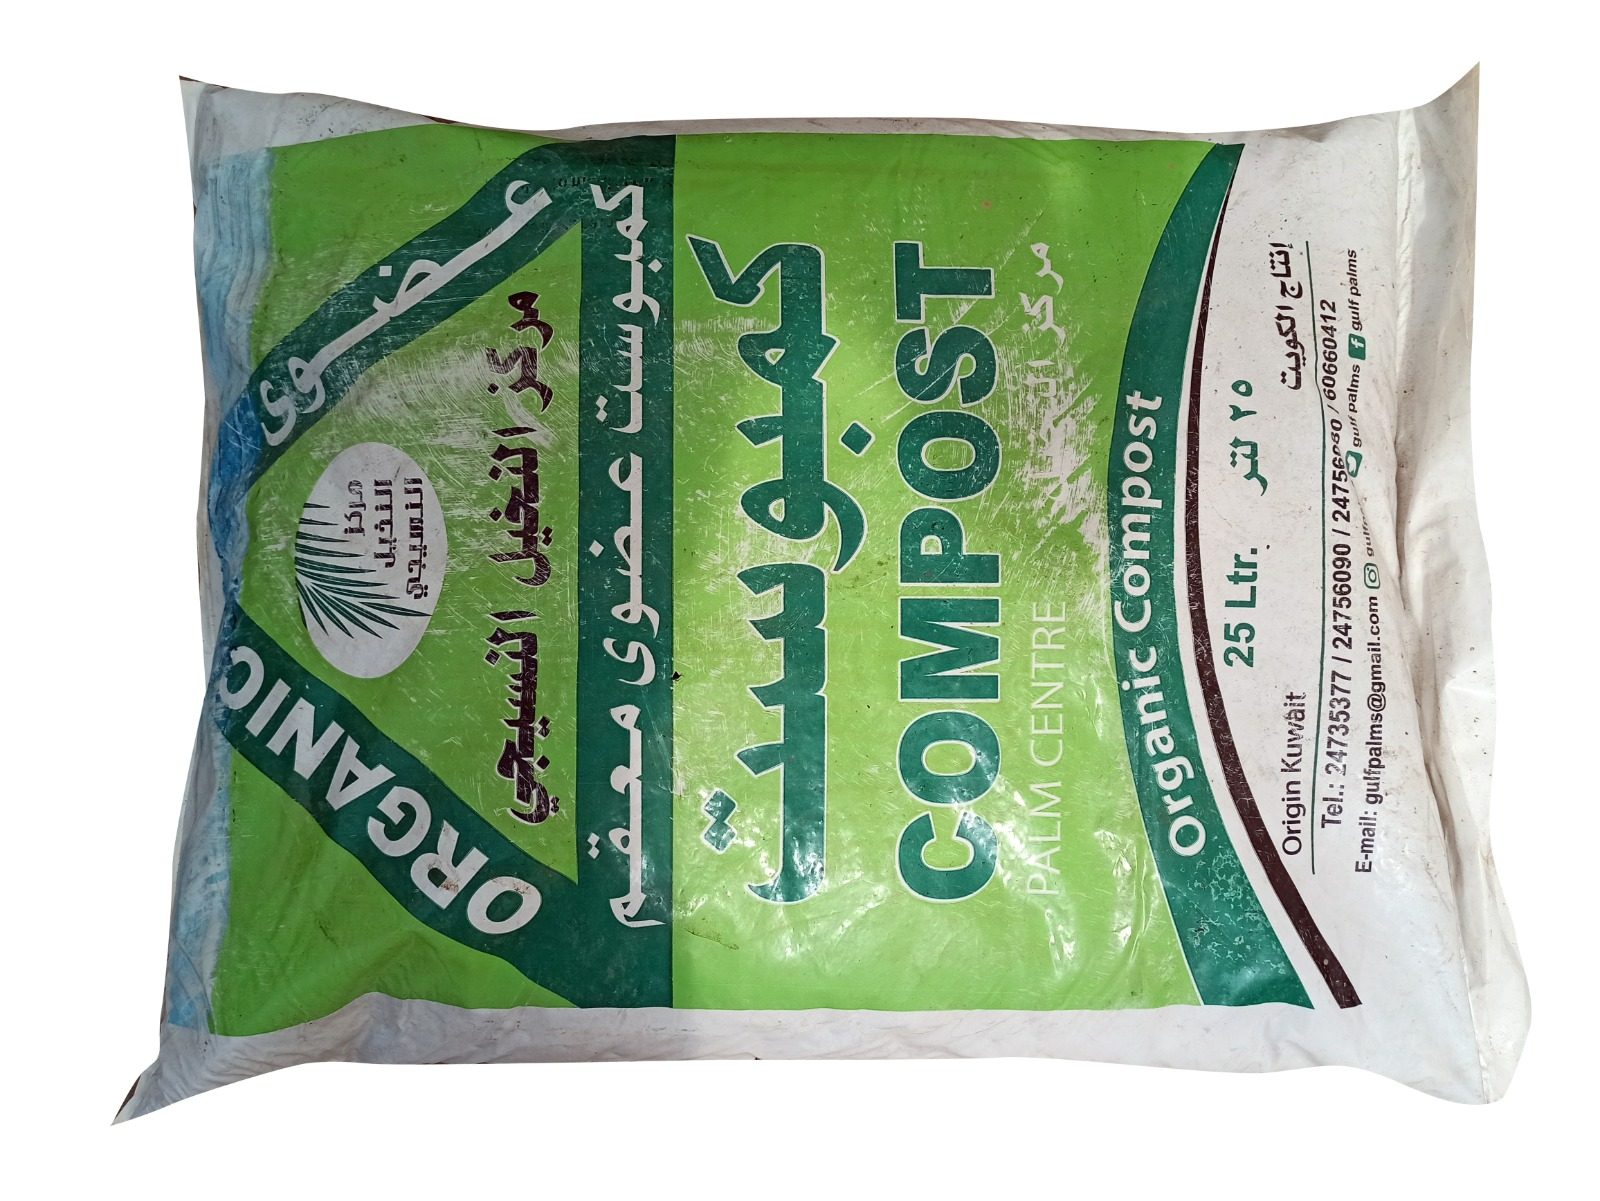 Compost Organic 'Soil Fertilizer Pesticide'